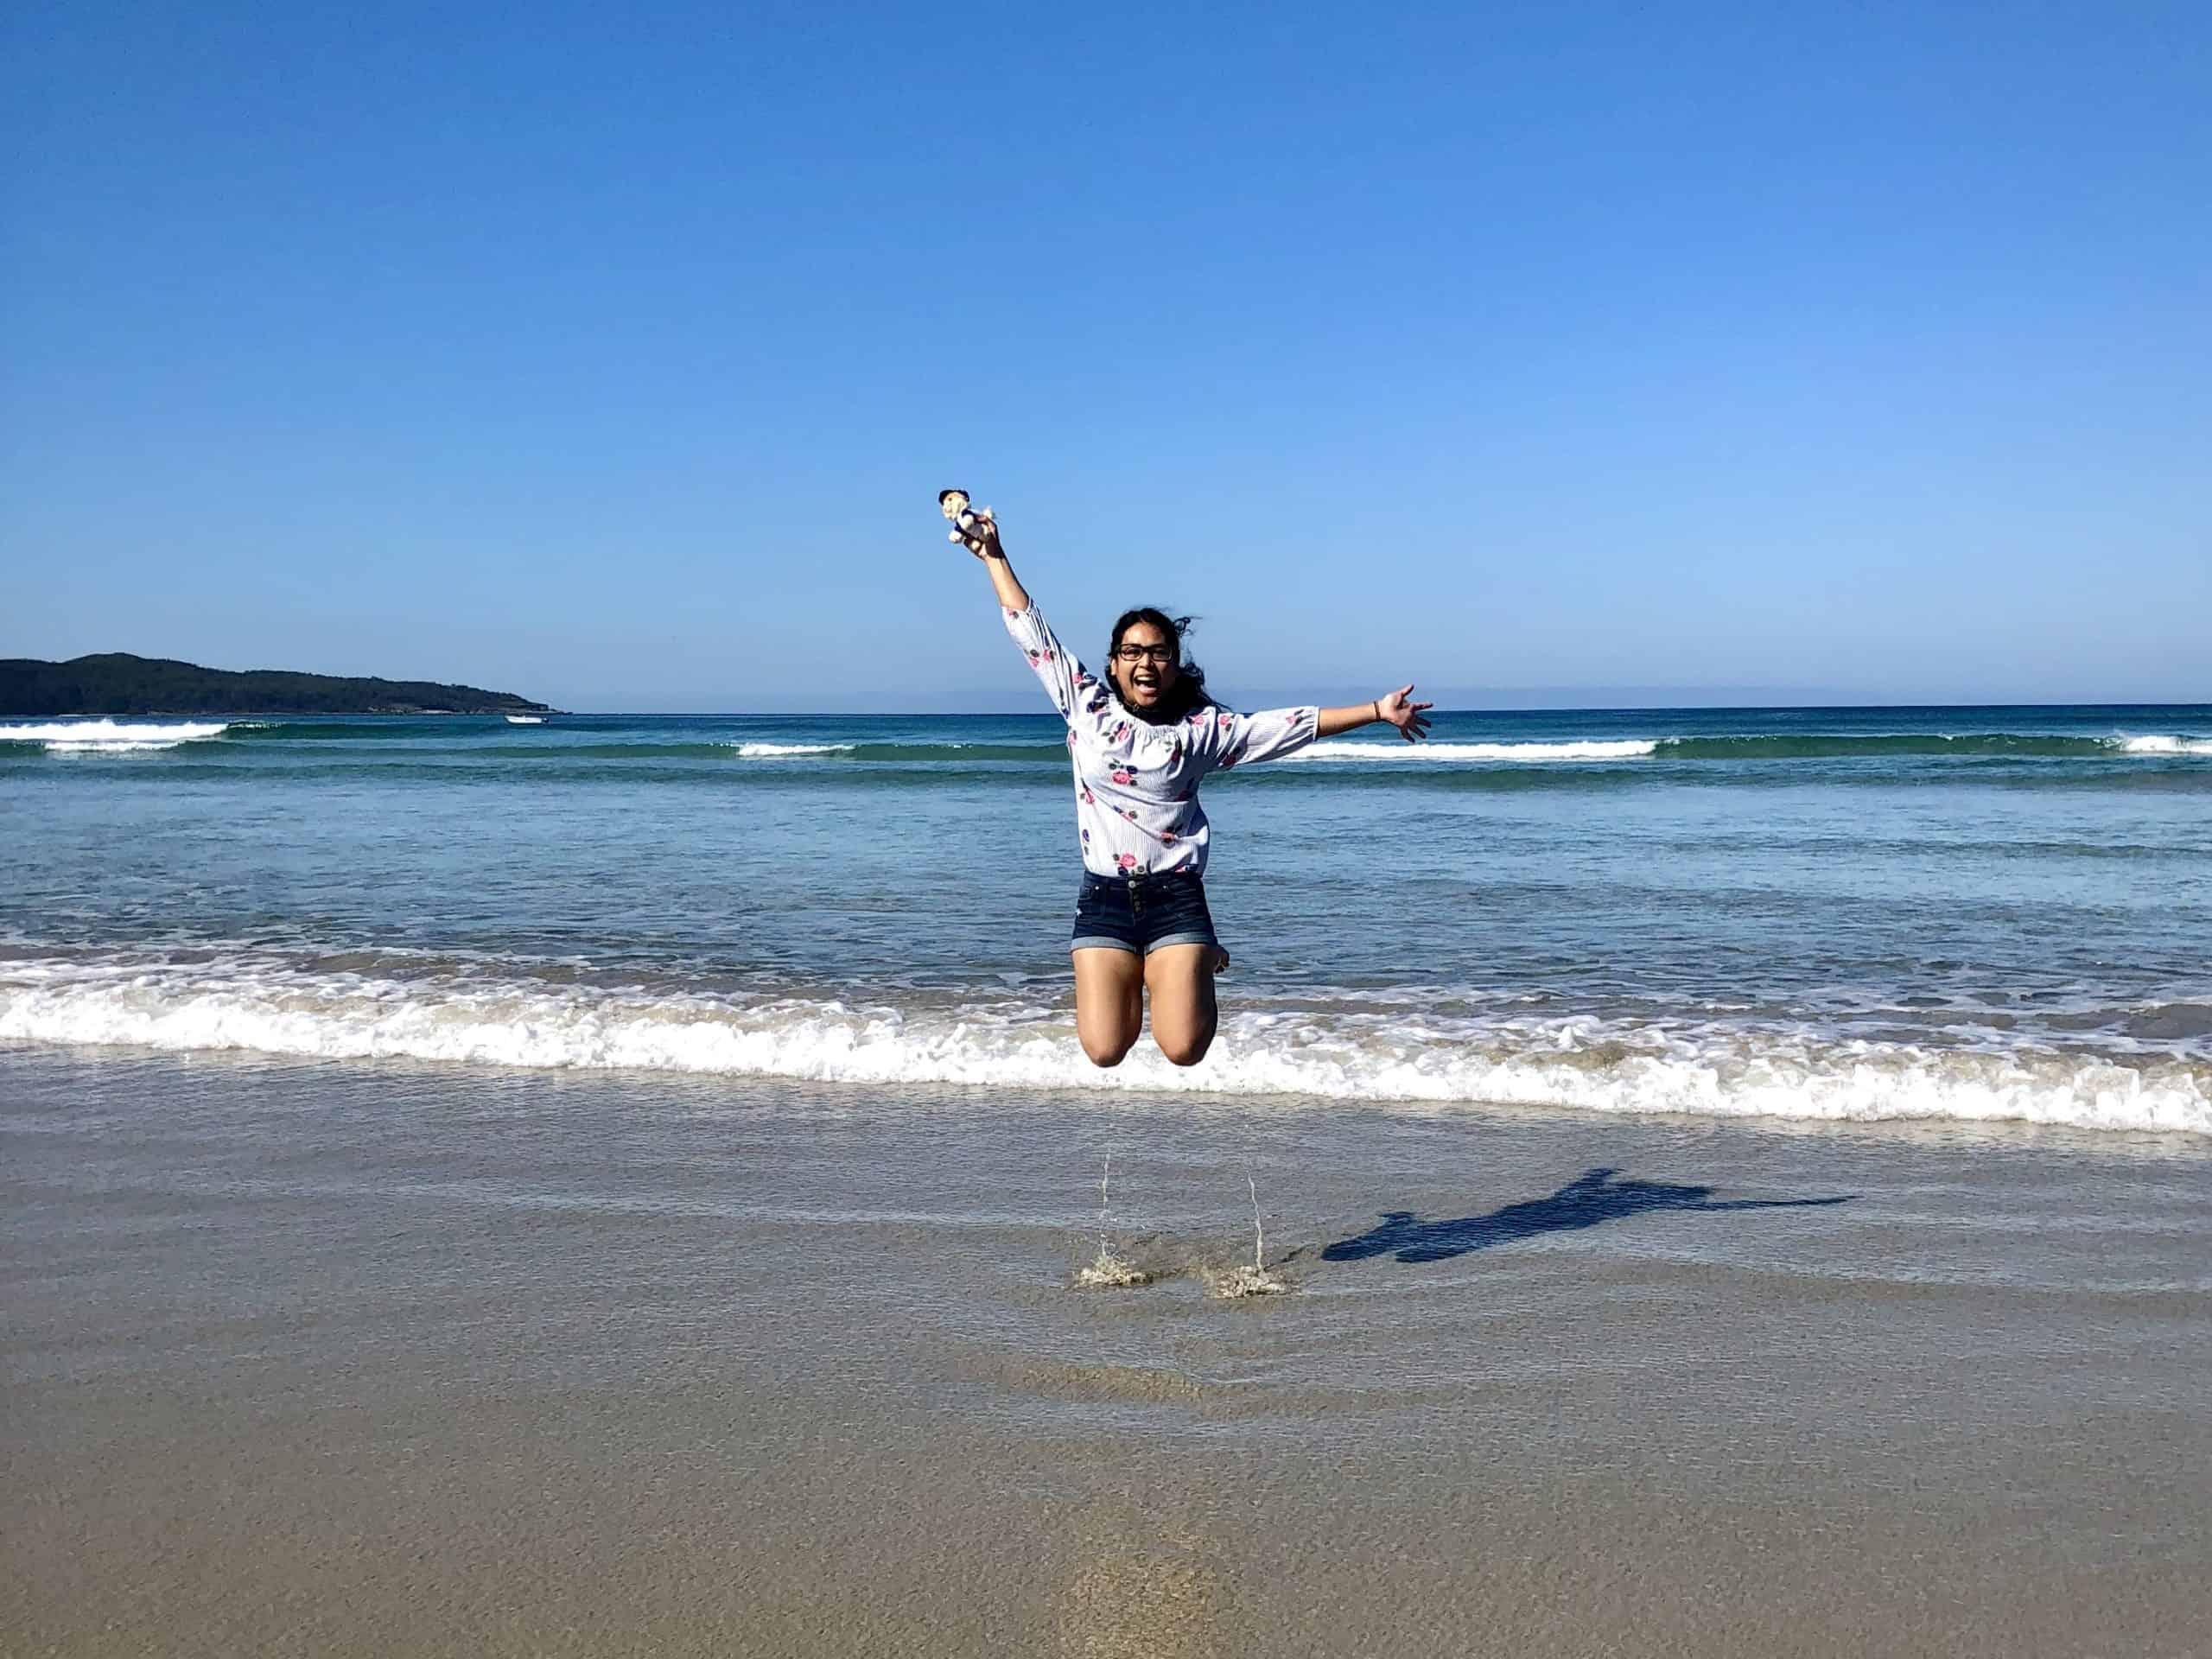 enjoying-life-living-to-the-fullest